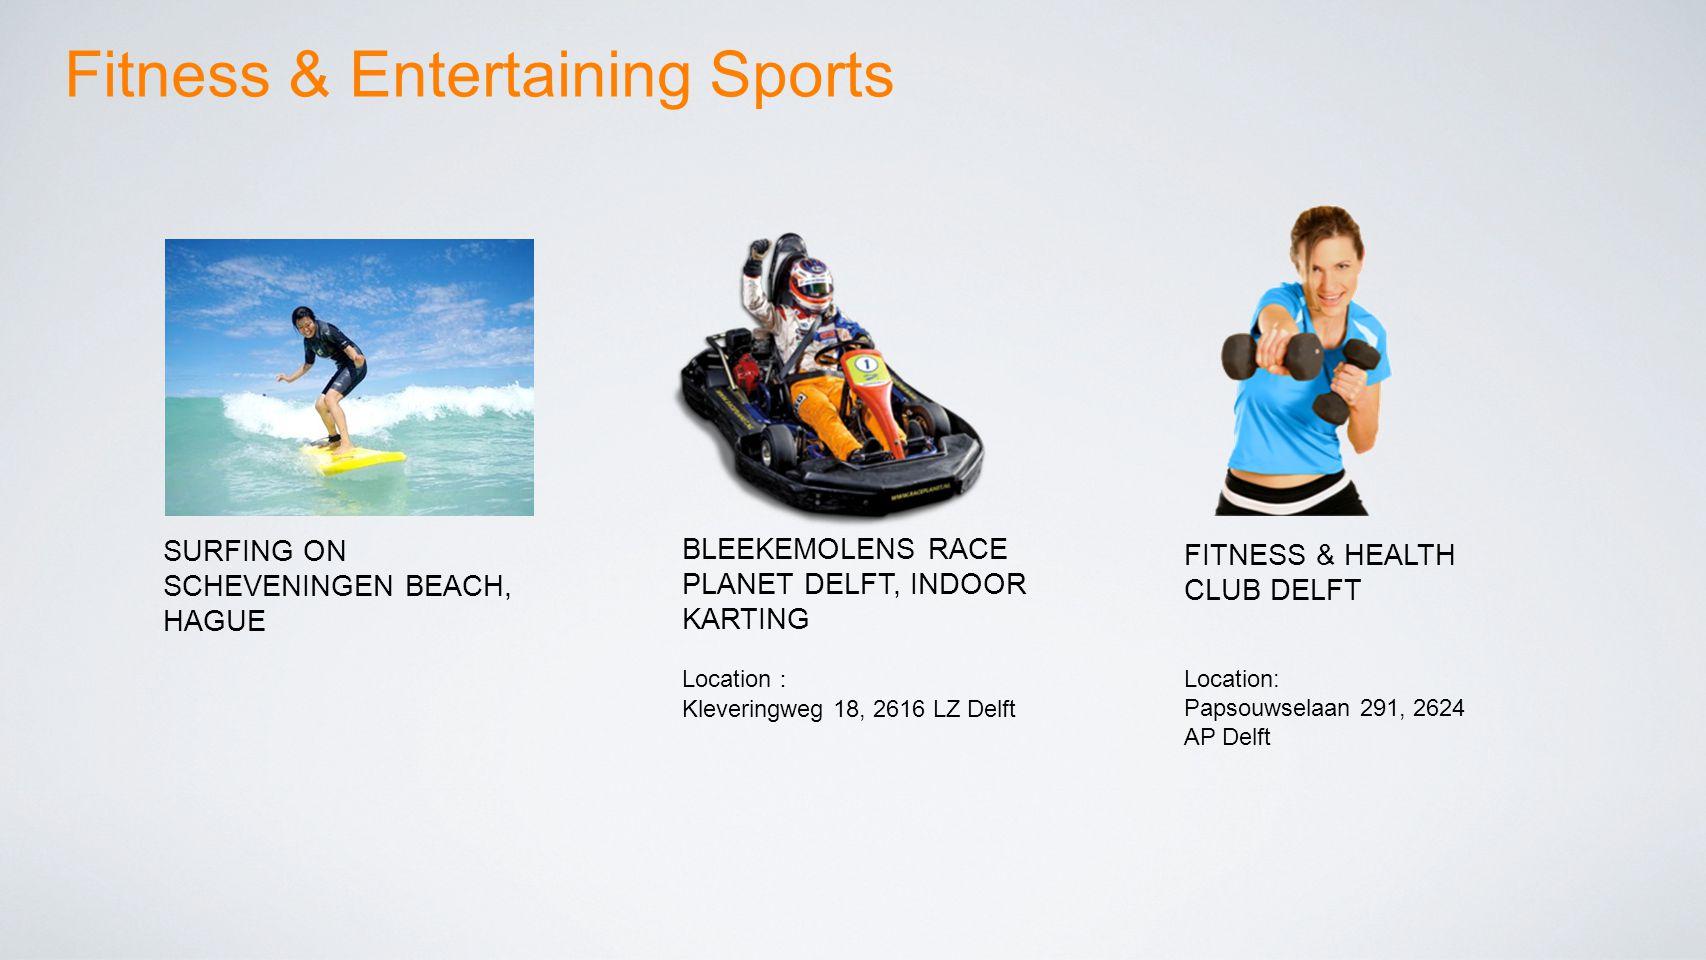 Fitness & Entertaining Sports SURFING ON SCHEVENINGEN BEACH, HAGUE BLEEKEMOLENS RACE PLANET DELFT, INDOOR KARTING Location : Kleveringweg 18, 2616 LZ Delft FITNESS & HEALTH CLUB DELFT Location: Papsouwselaan 291, 2624 AP Delft